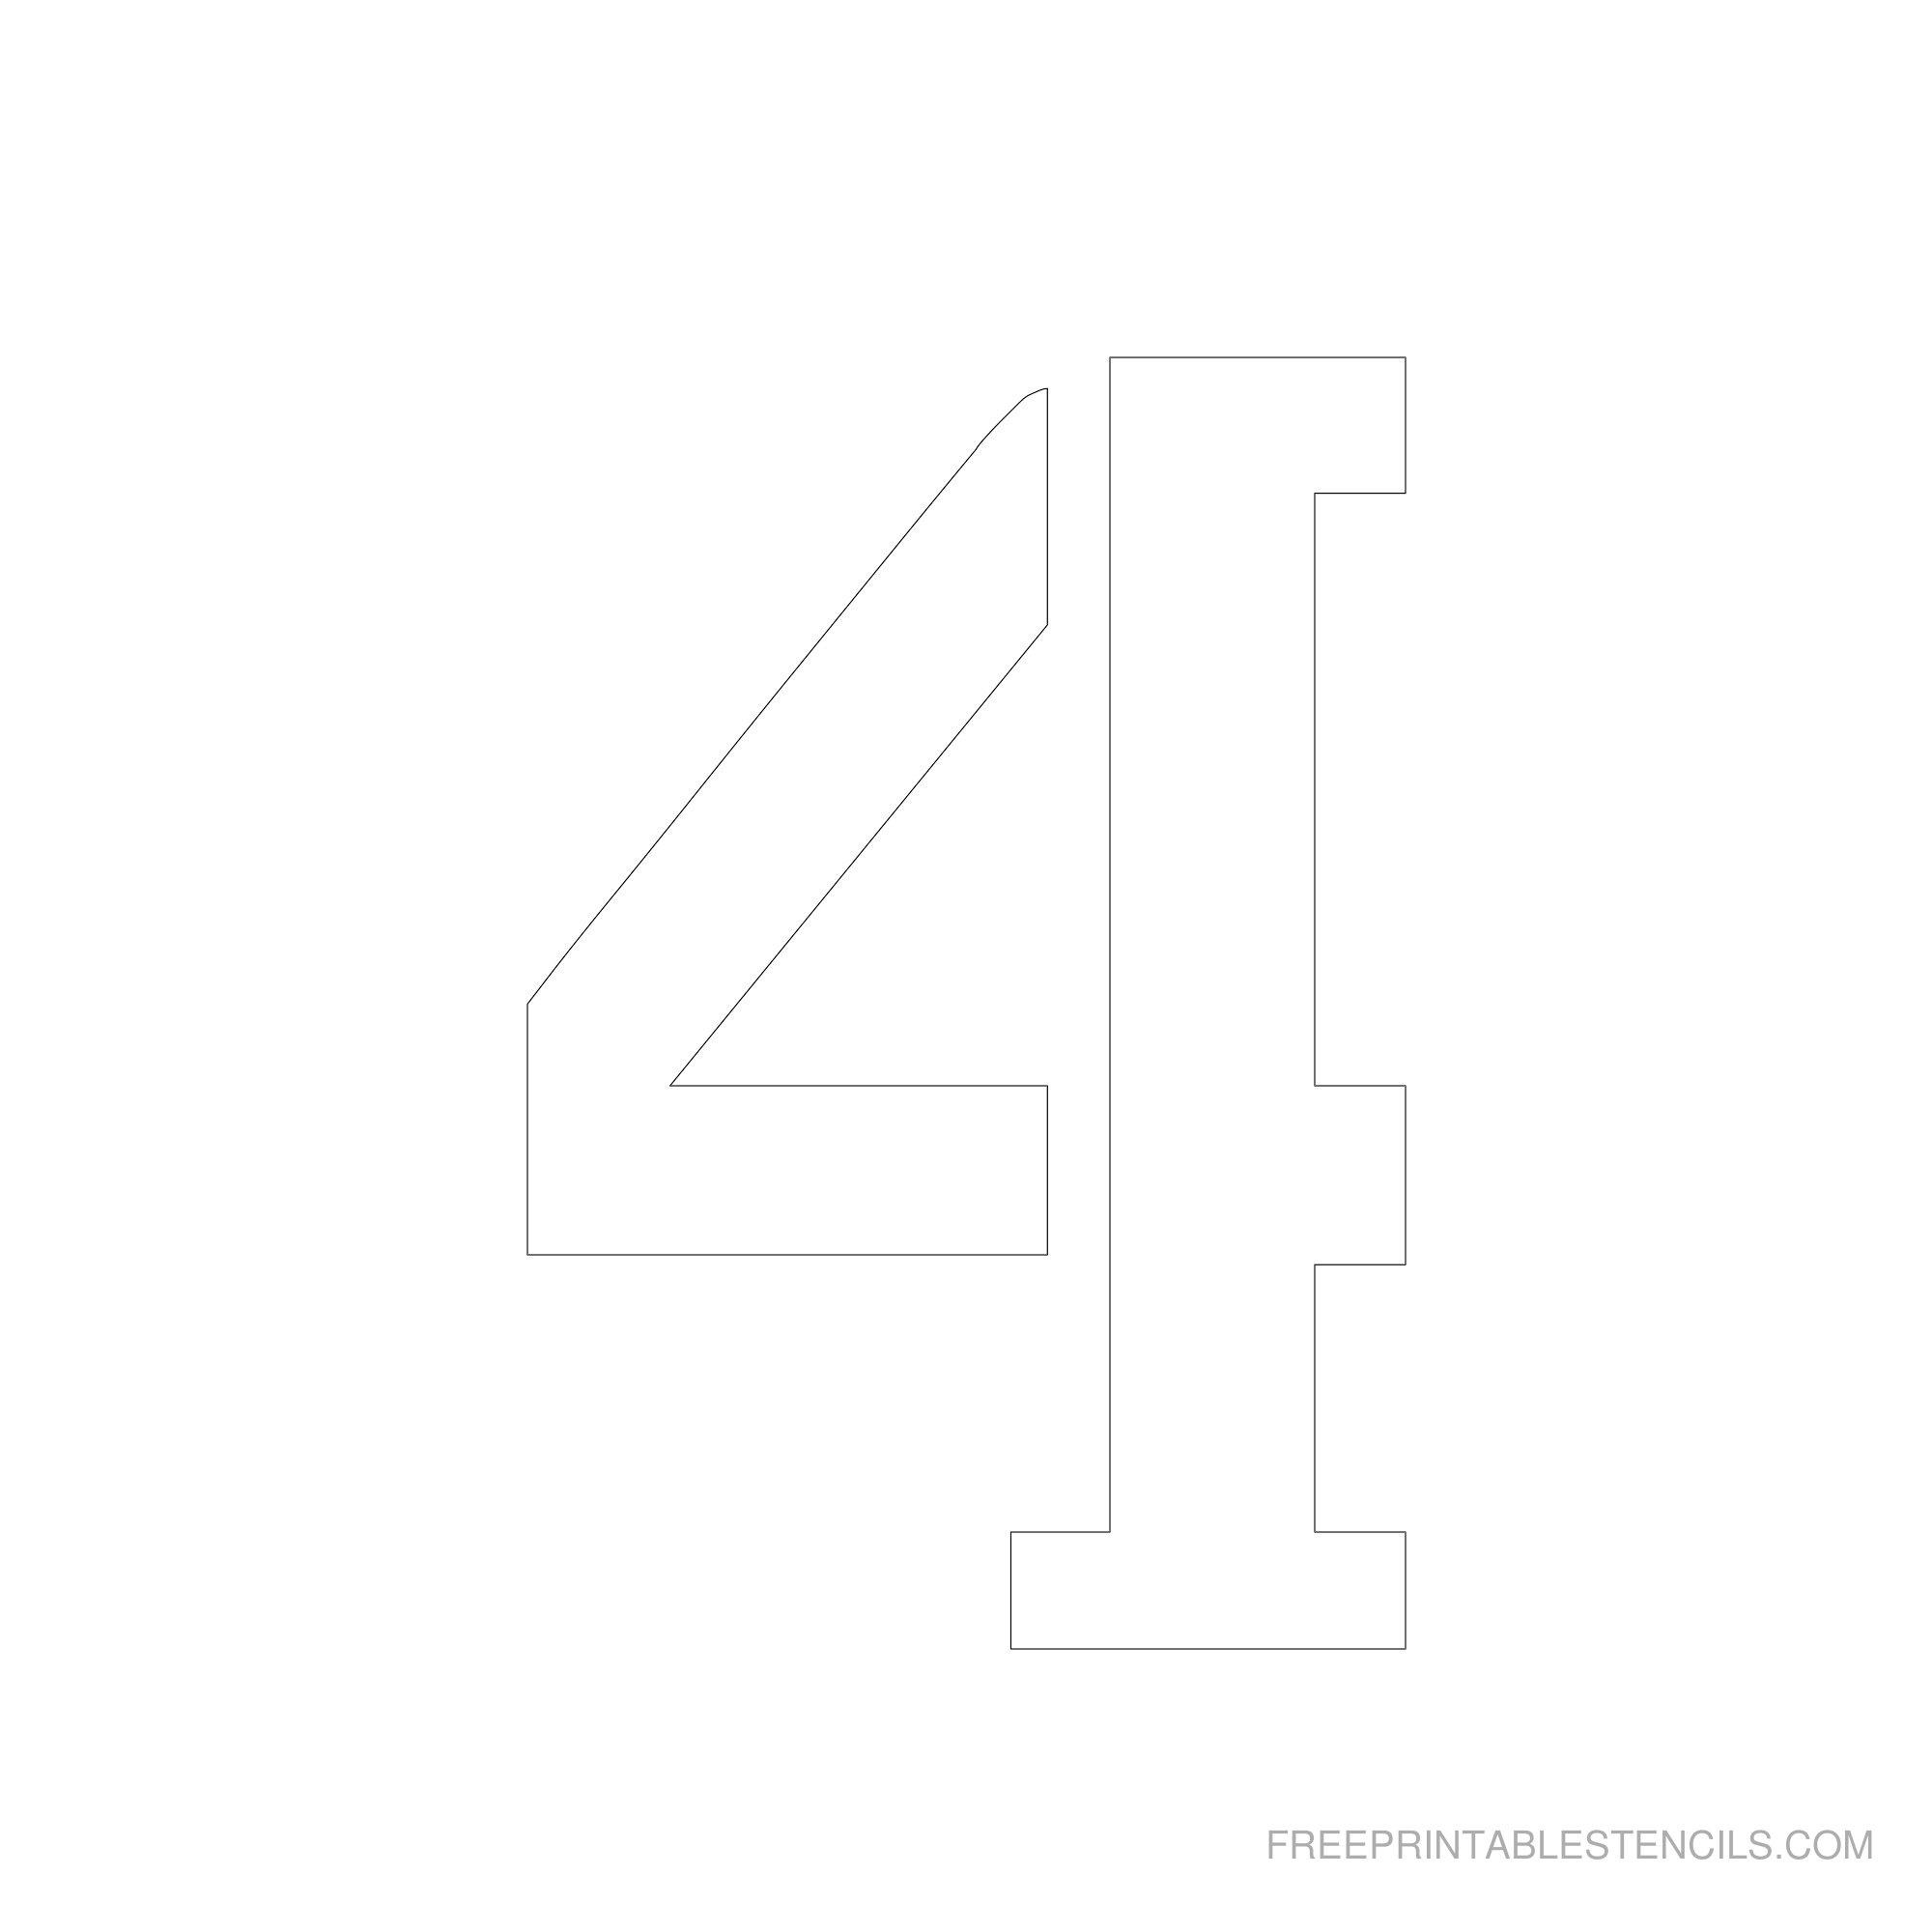 Printable 6 Inch Number Stencils 1-10   Free Printable Stencils - Free Printable 3 Inch Number Stencils